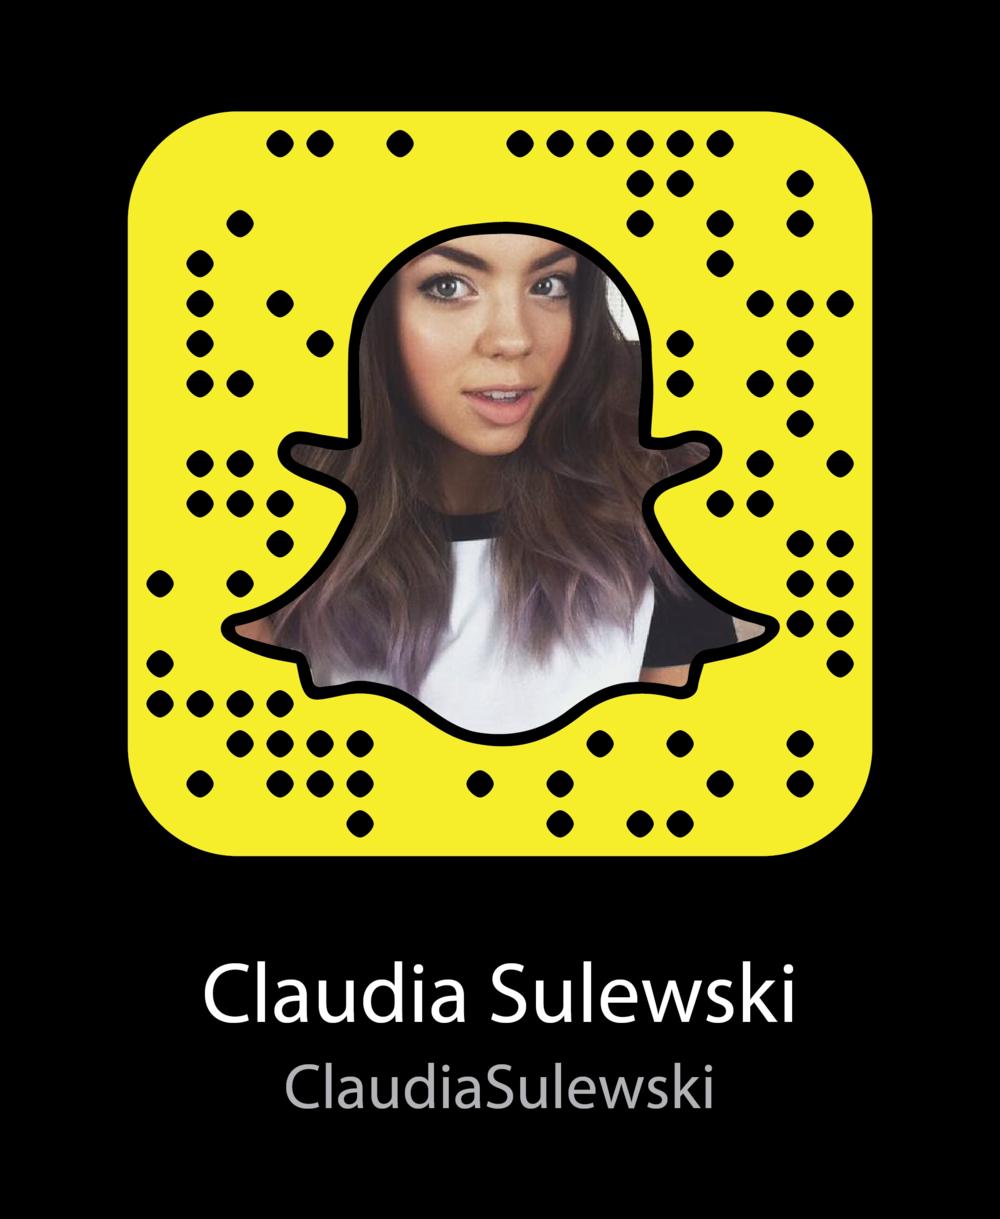 ClaudiaSulewski-Beauty-Bloggers-snapchat-snapcode.png